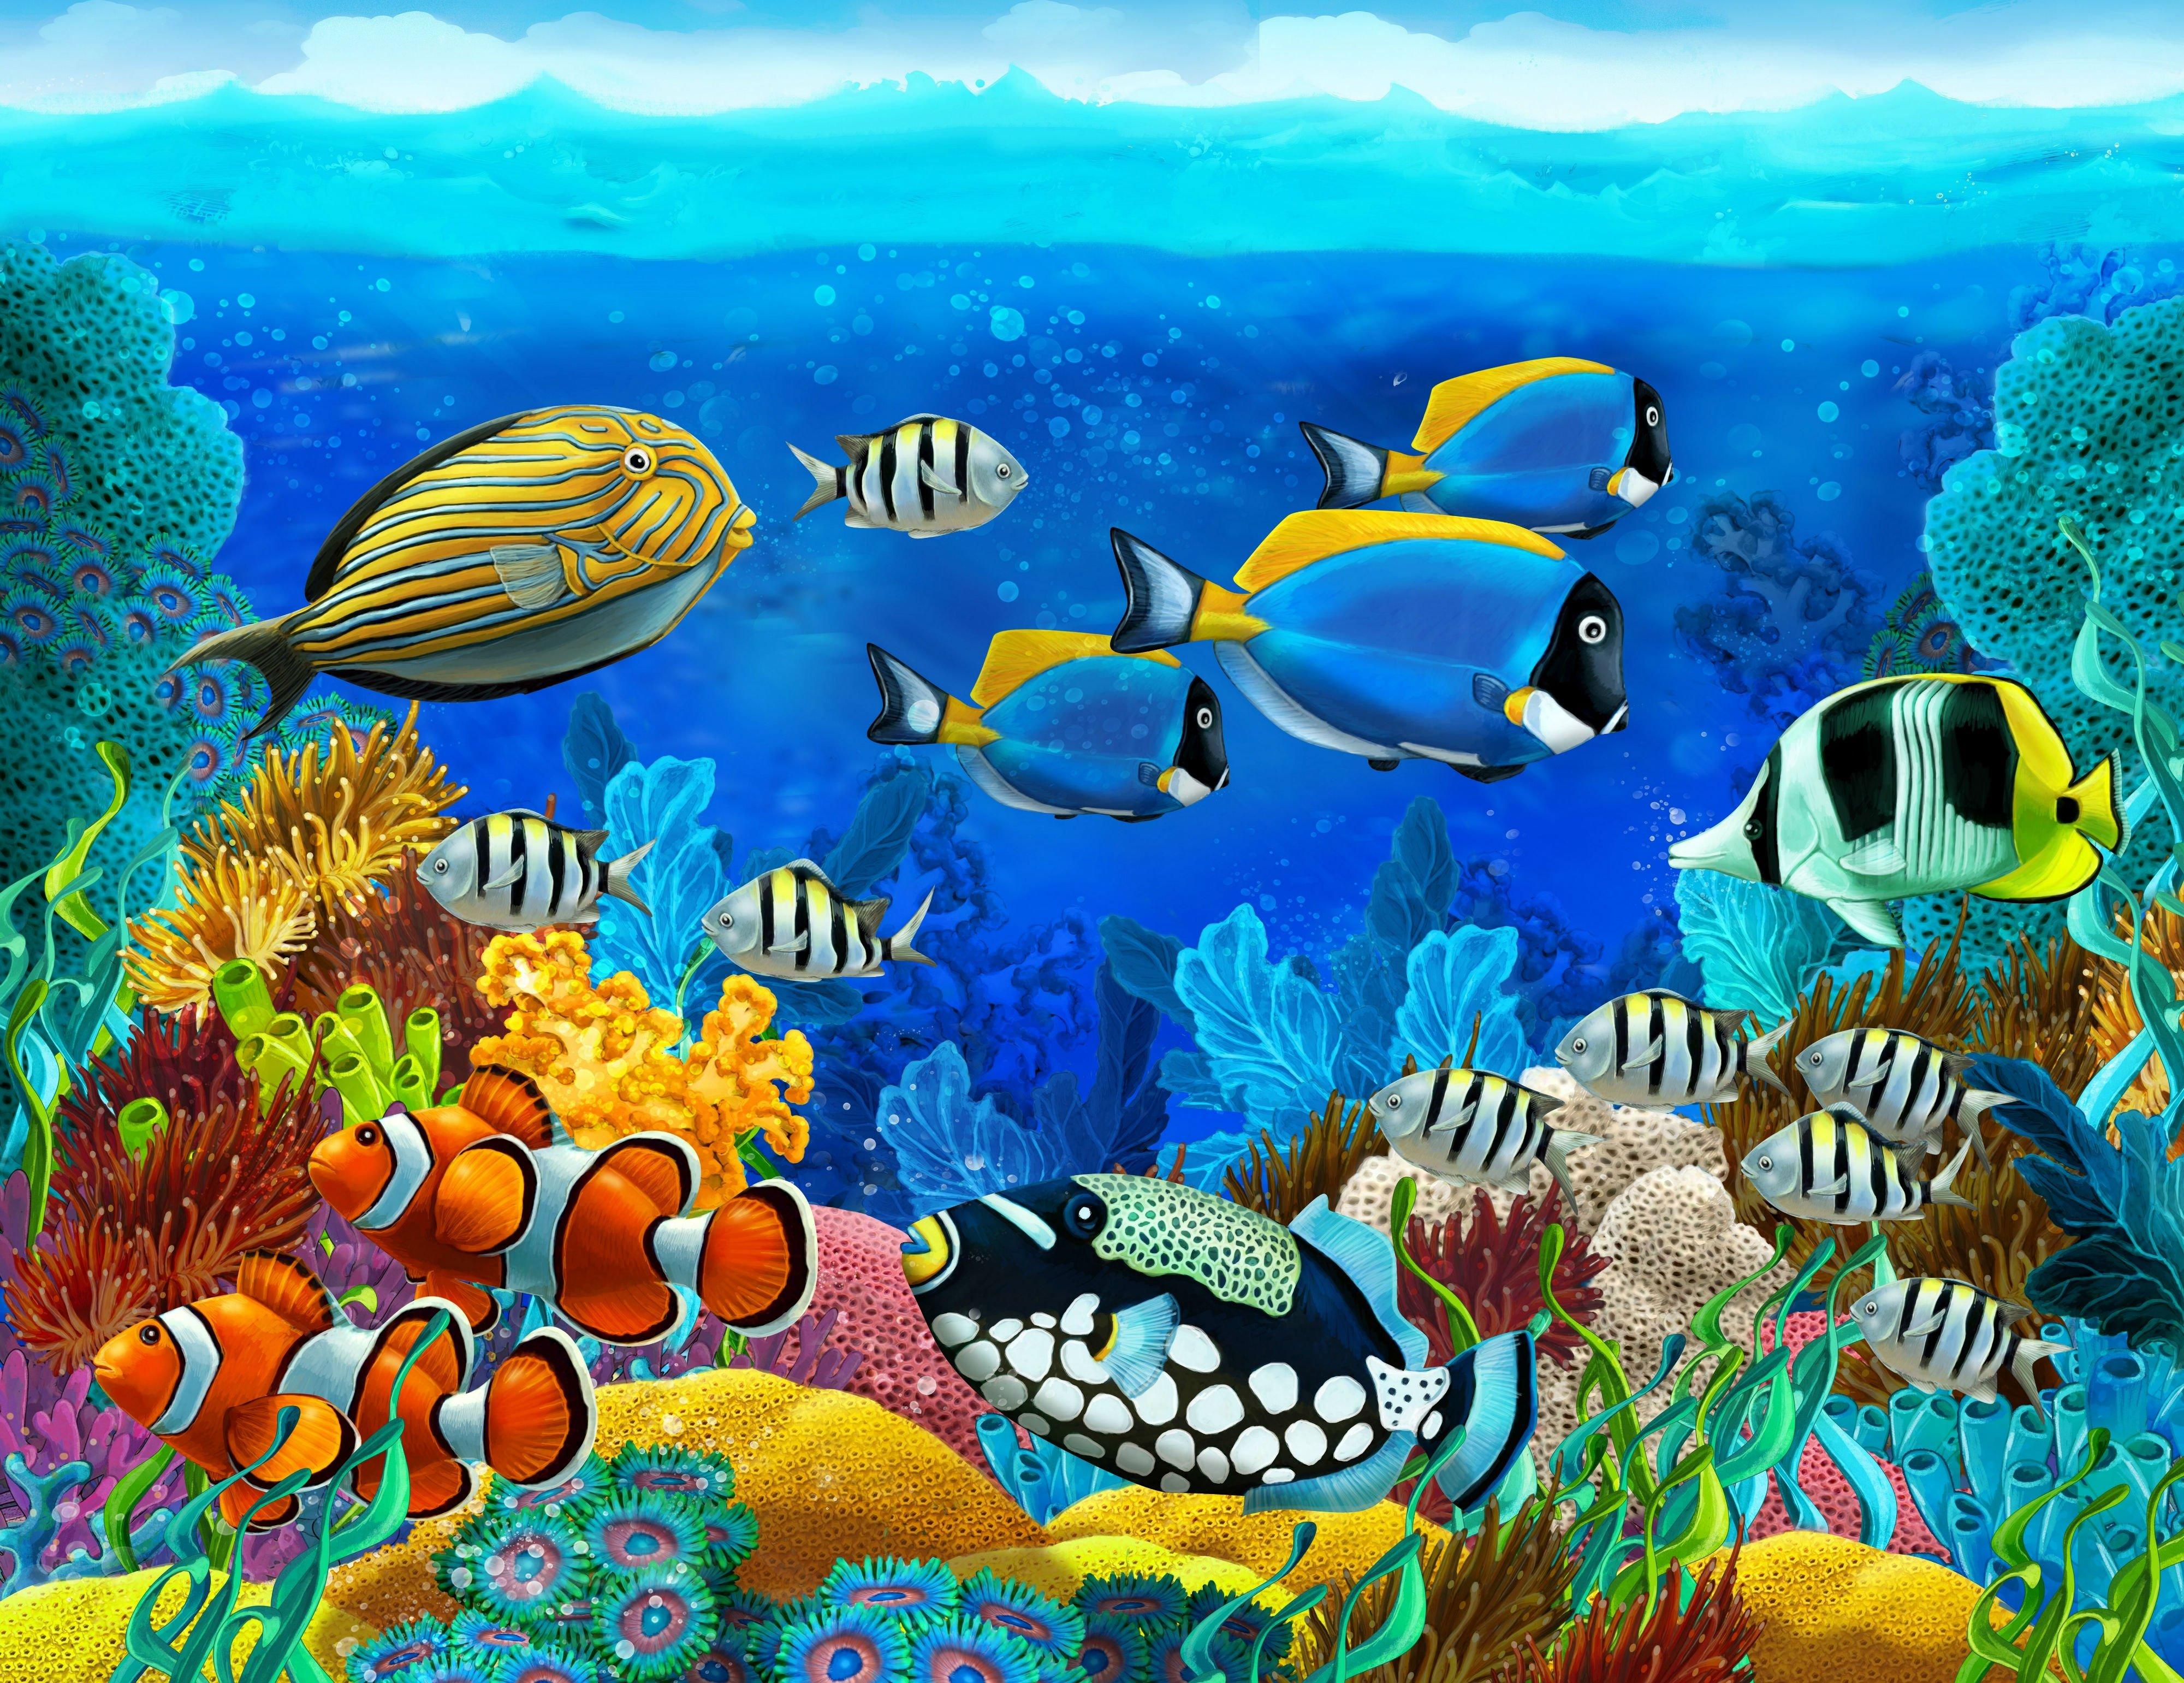 Sea Seabed Fish Corals Underwater Ocean Tropical G Wallpaper